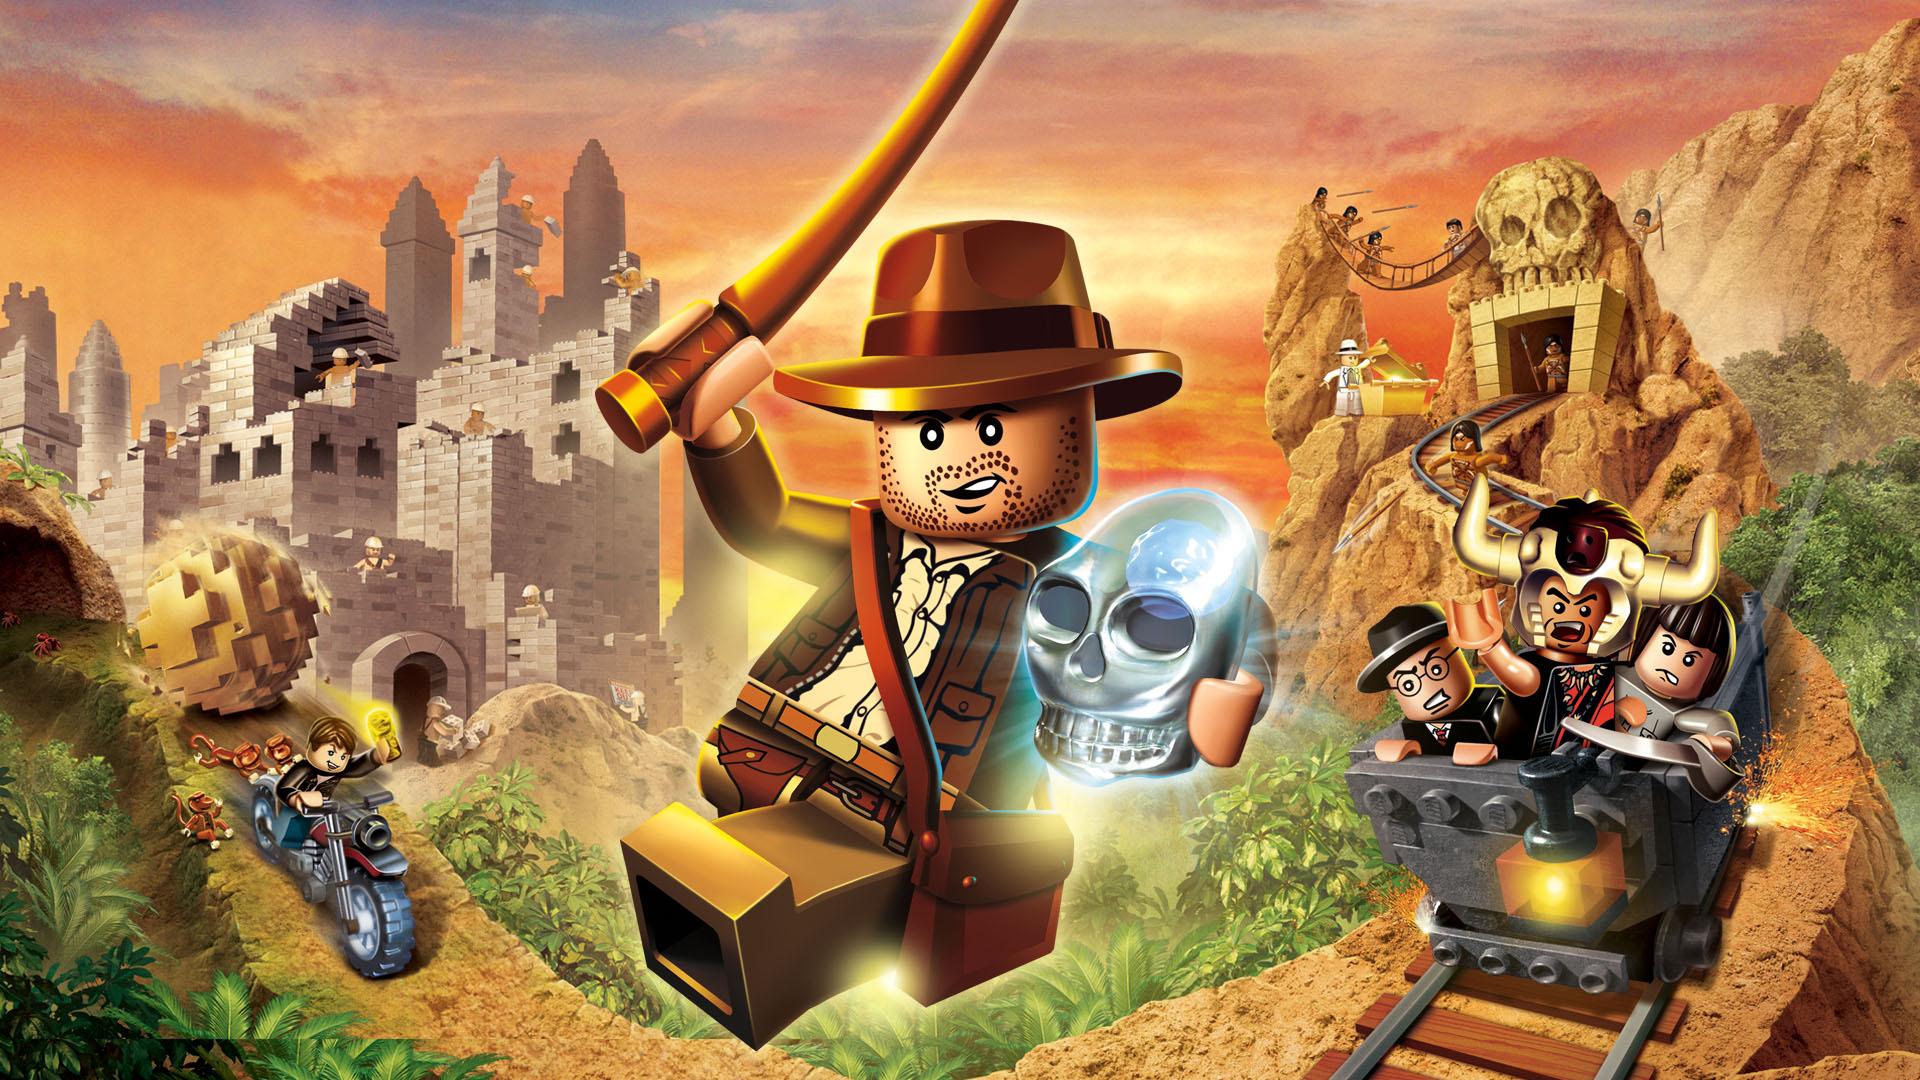 1 Lego Indiana Jones 2 The Adventure Continues Hd